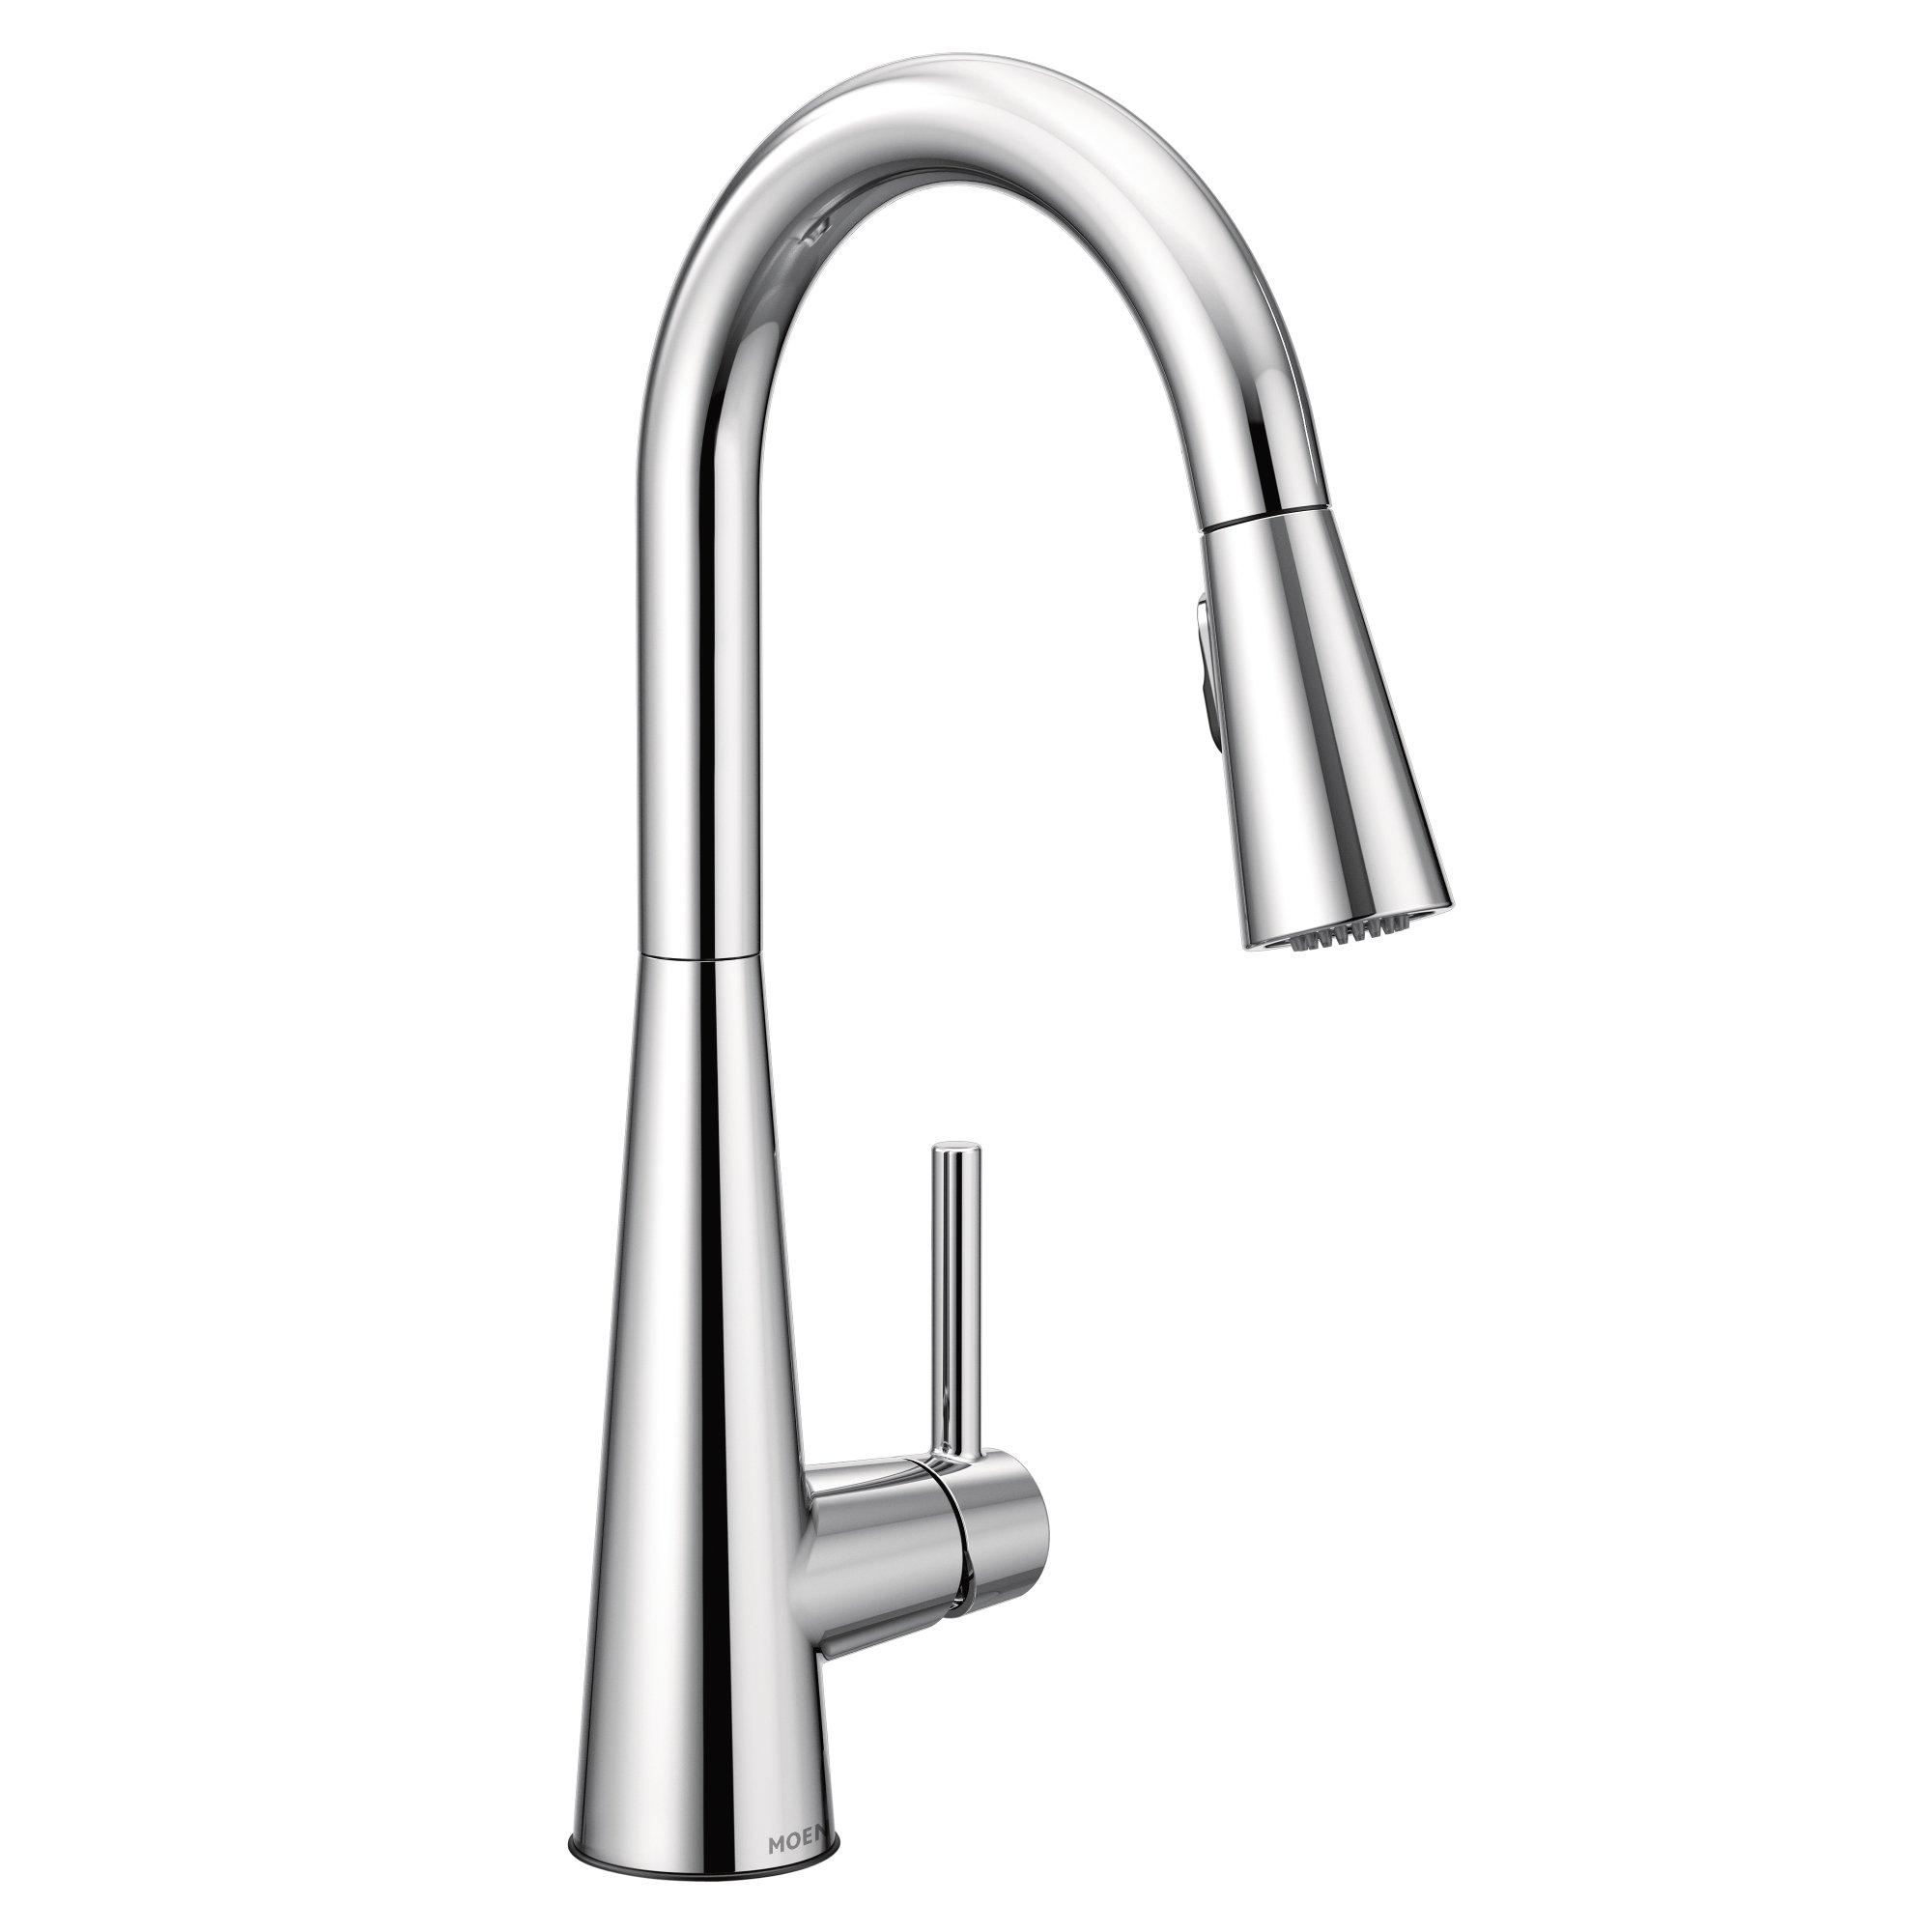 Moen 7864 Sleek One-Handle High Arc Pulldown Kitchen Faucet Featuring Reflex (7864), Chrome